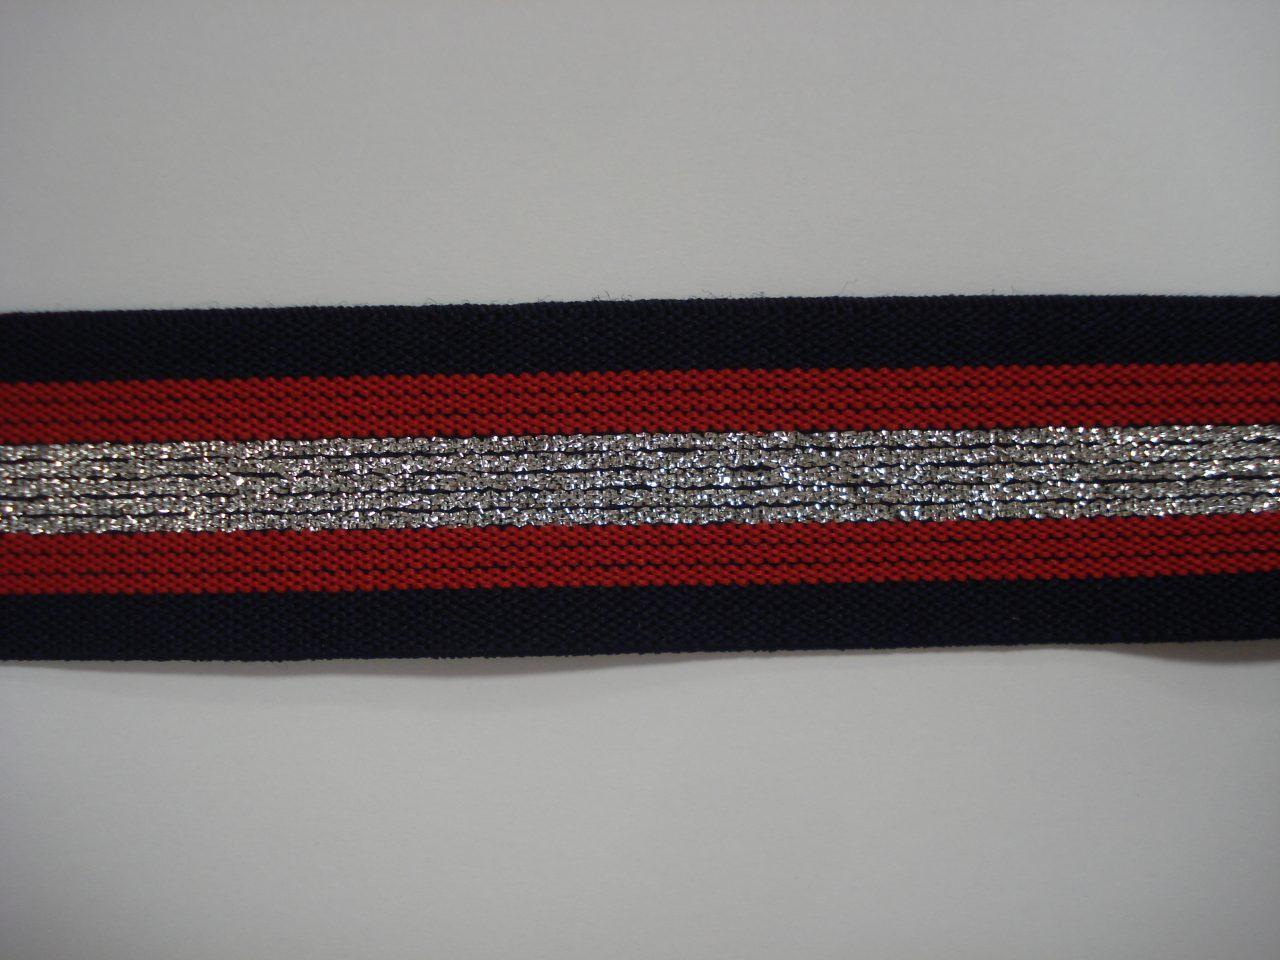 d73b27a3a3a Gestreept Elastiek blauw/rood/zilver/rood/blauw 30mm. halve meter €